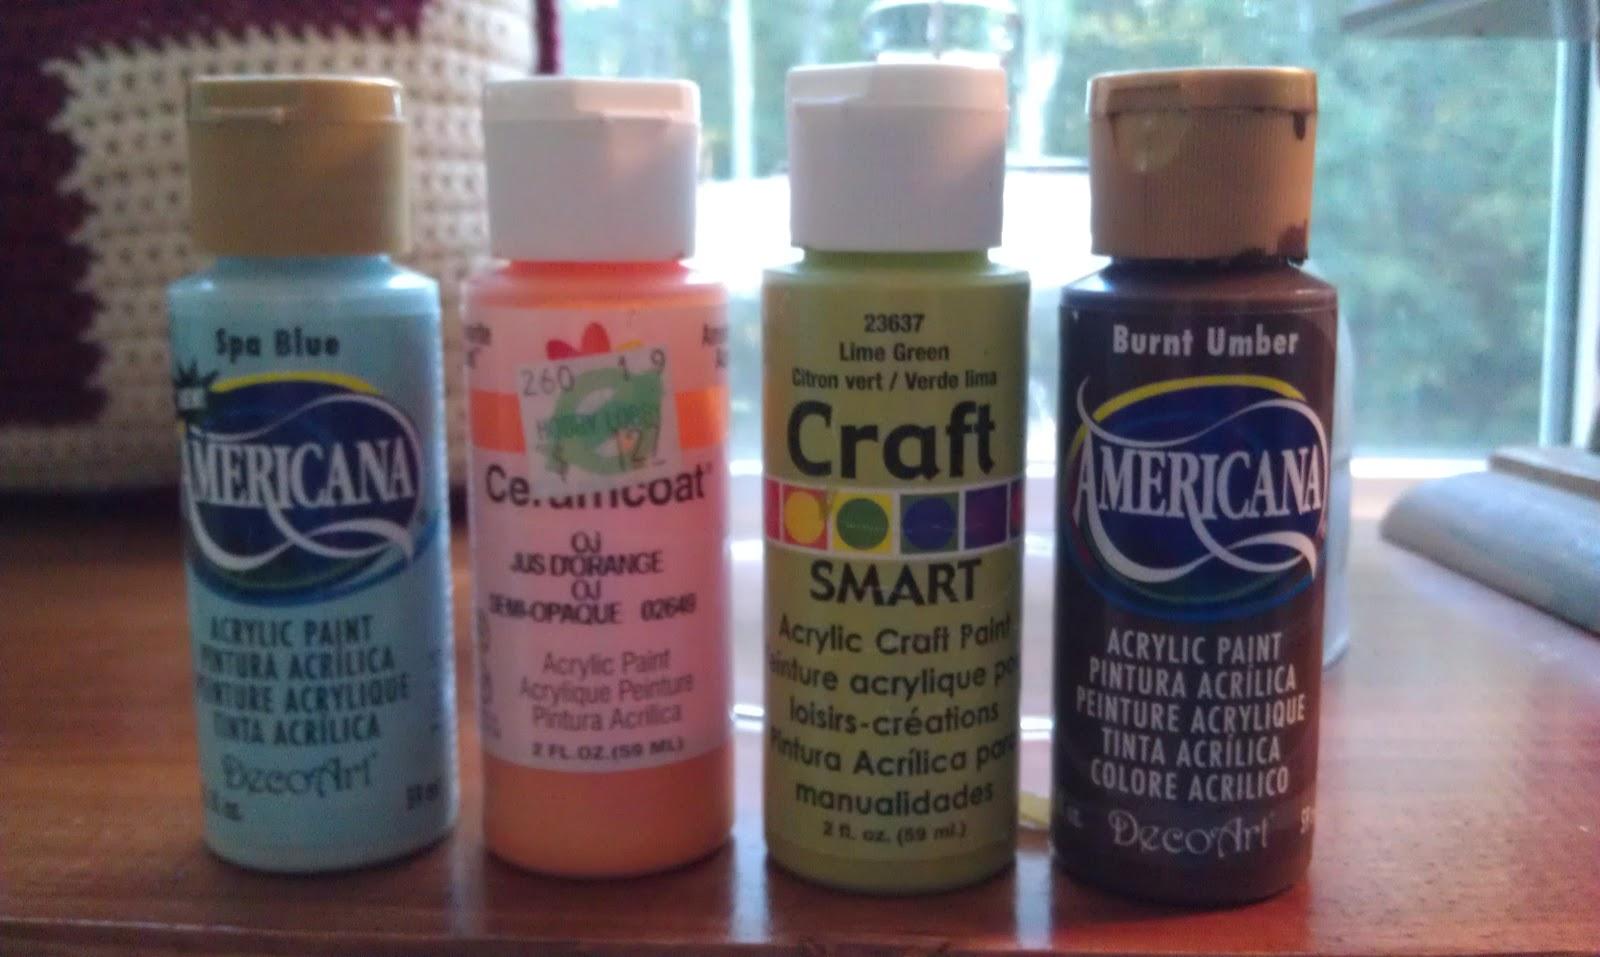 Craft Smart Acrylic Paint Amazon